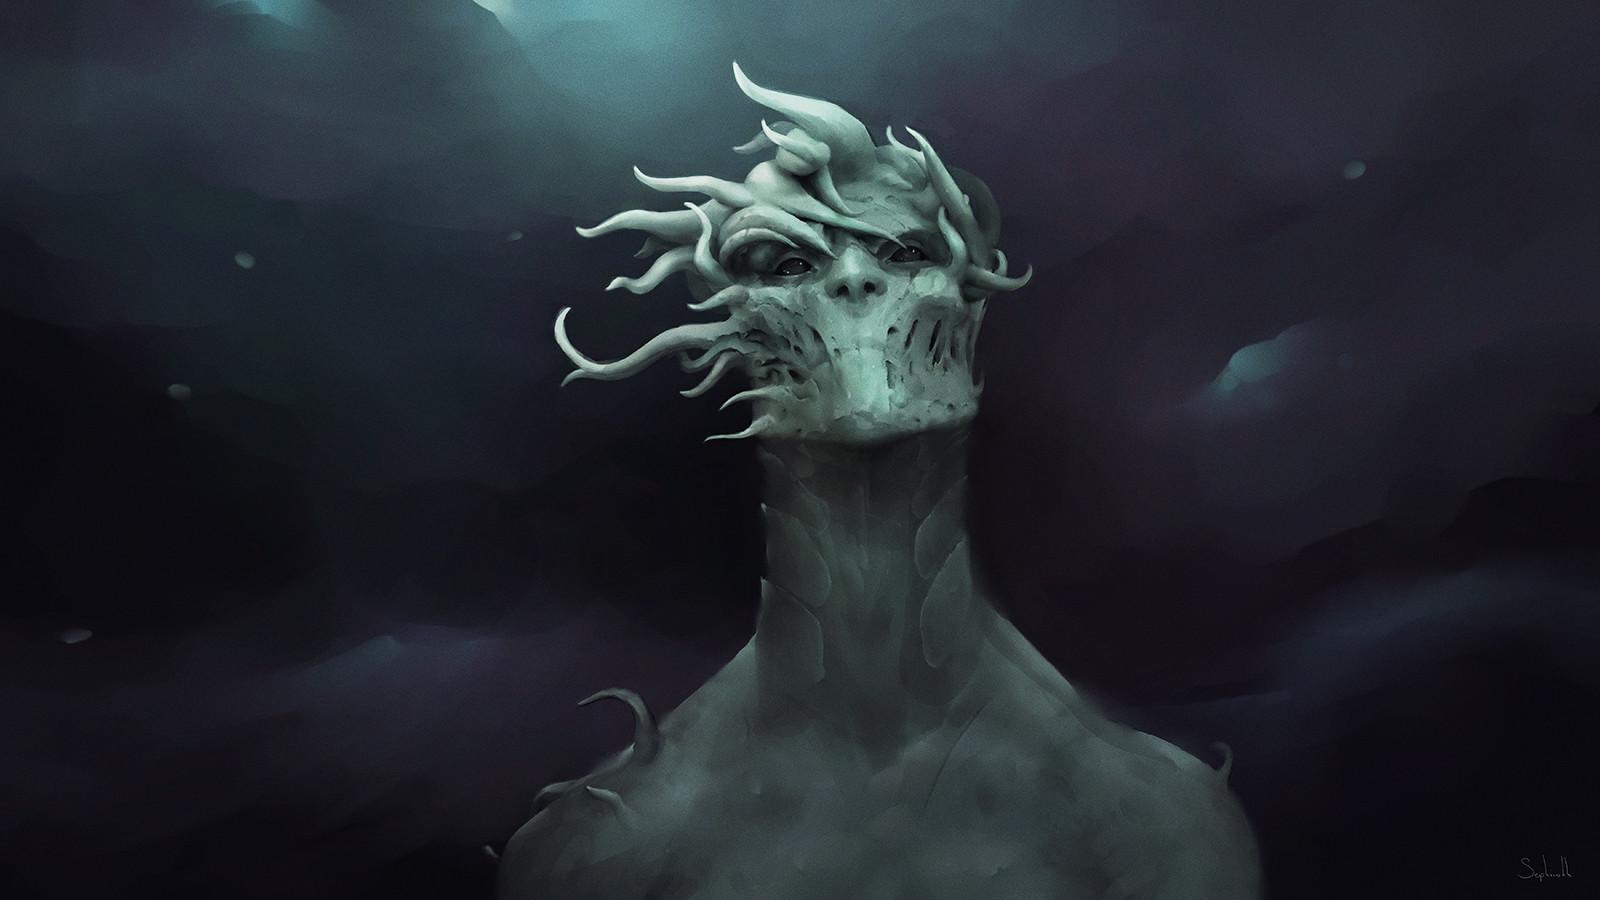 Sephiroth art before the rain